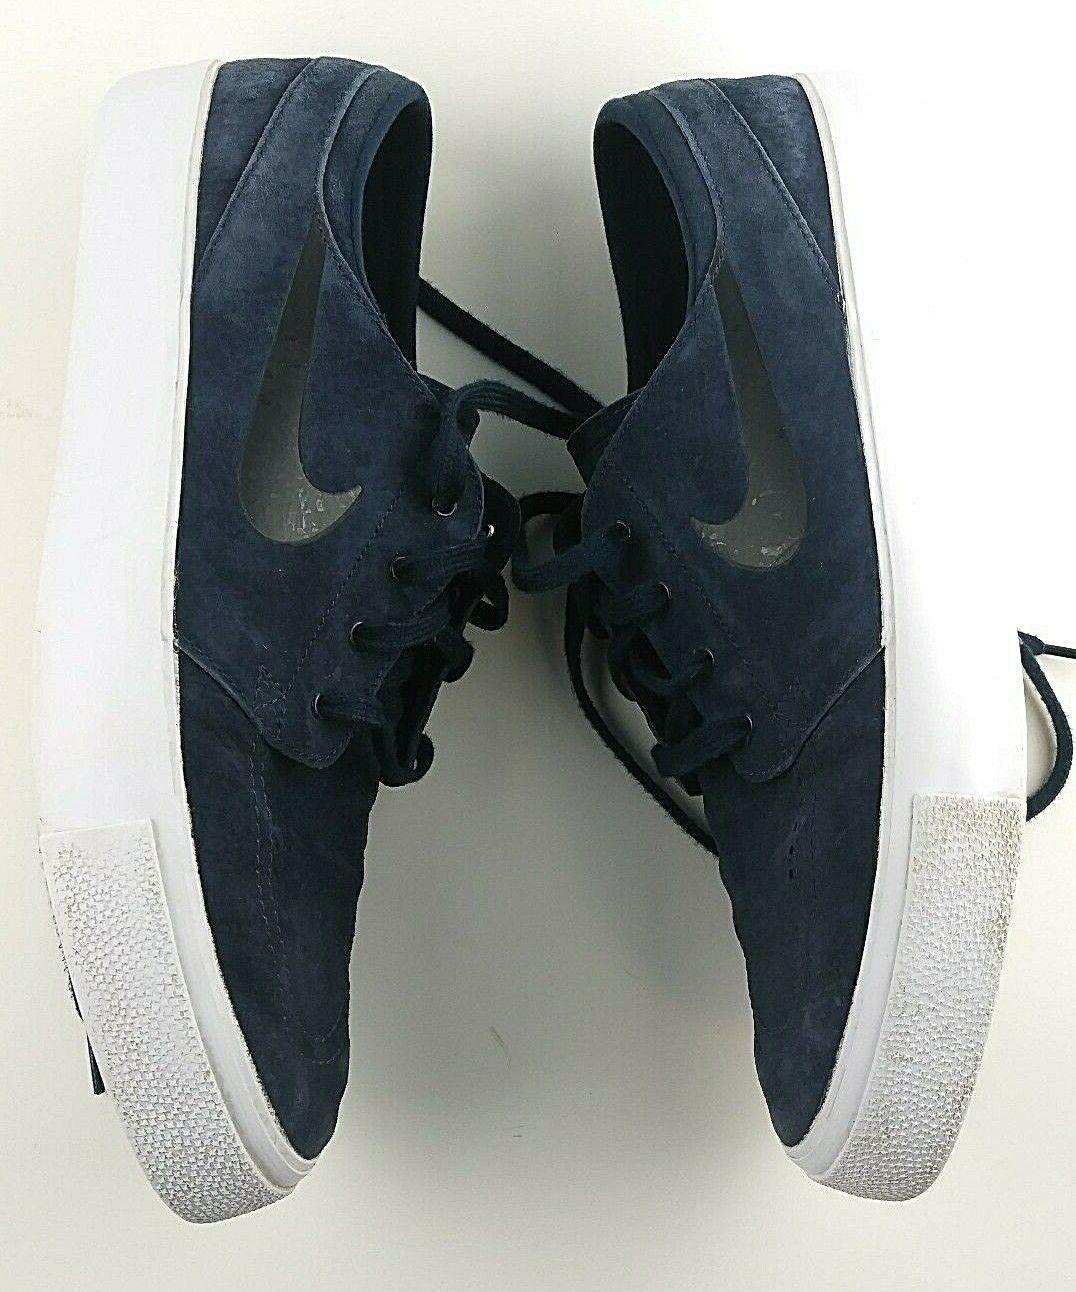 Nike Sb Zoom Stefan Janoski Premium Alta Nastro Uomo Misura 12 - Sautope Blu  89 Sautope classeiche da uomo